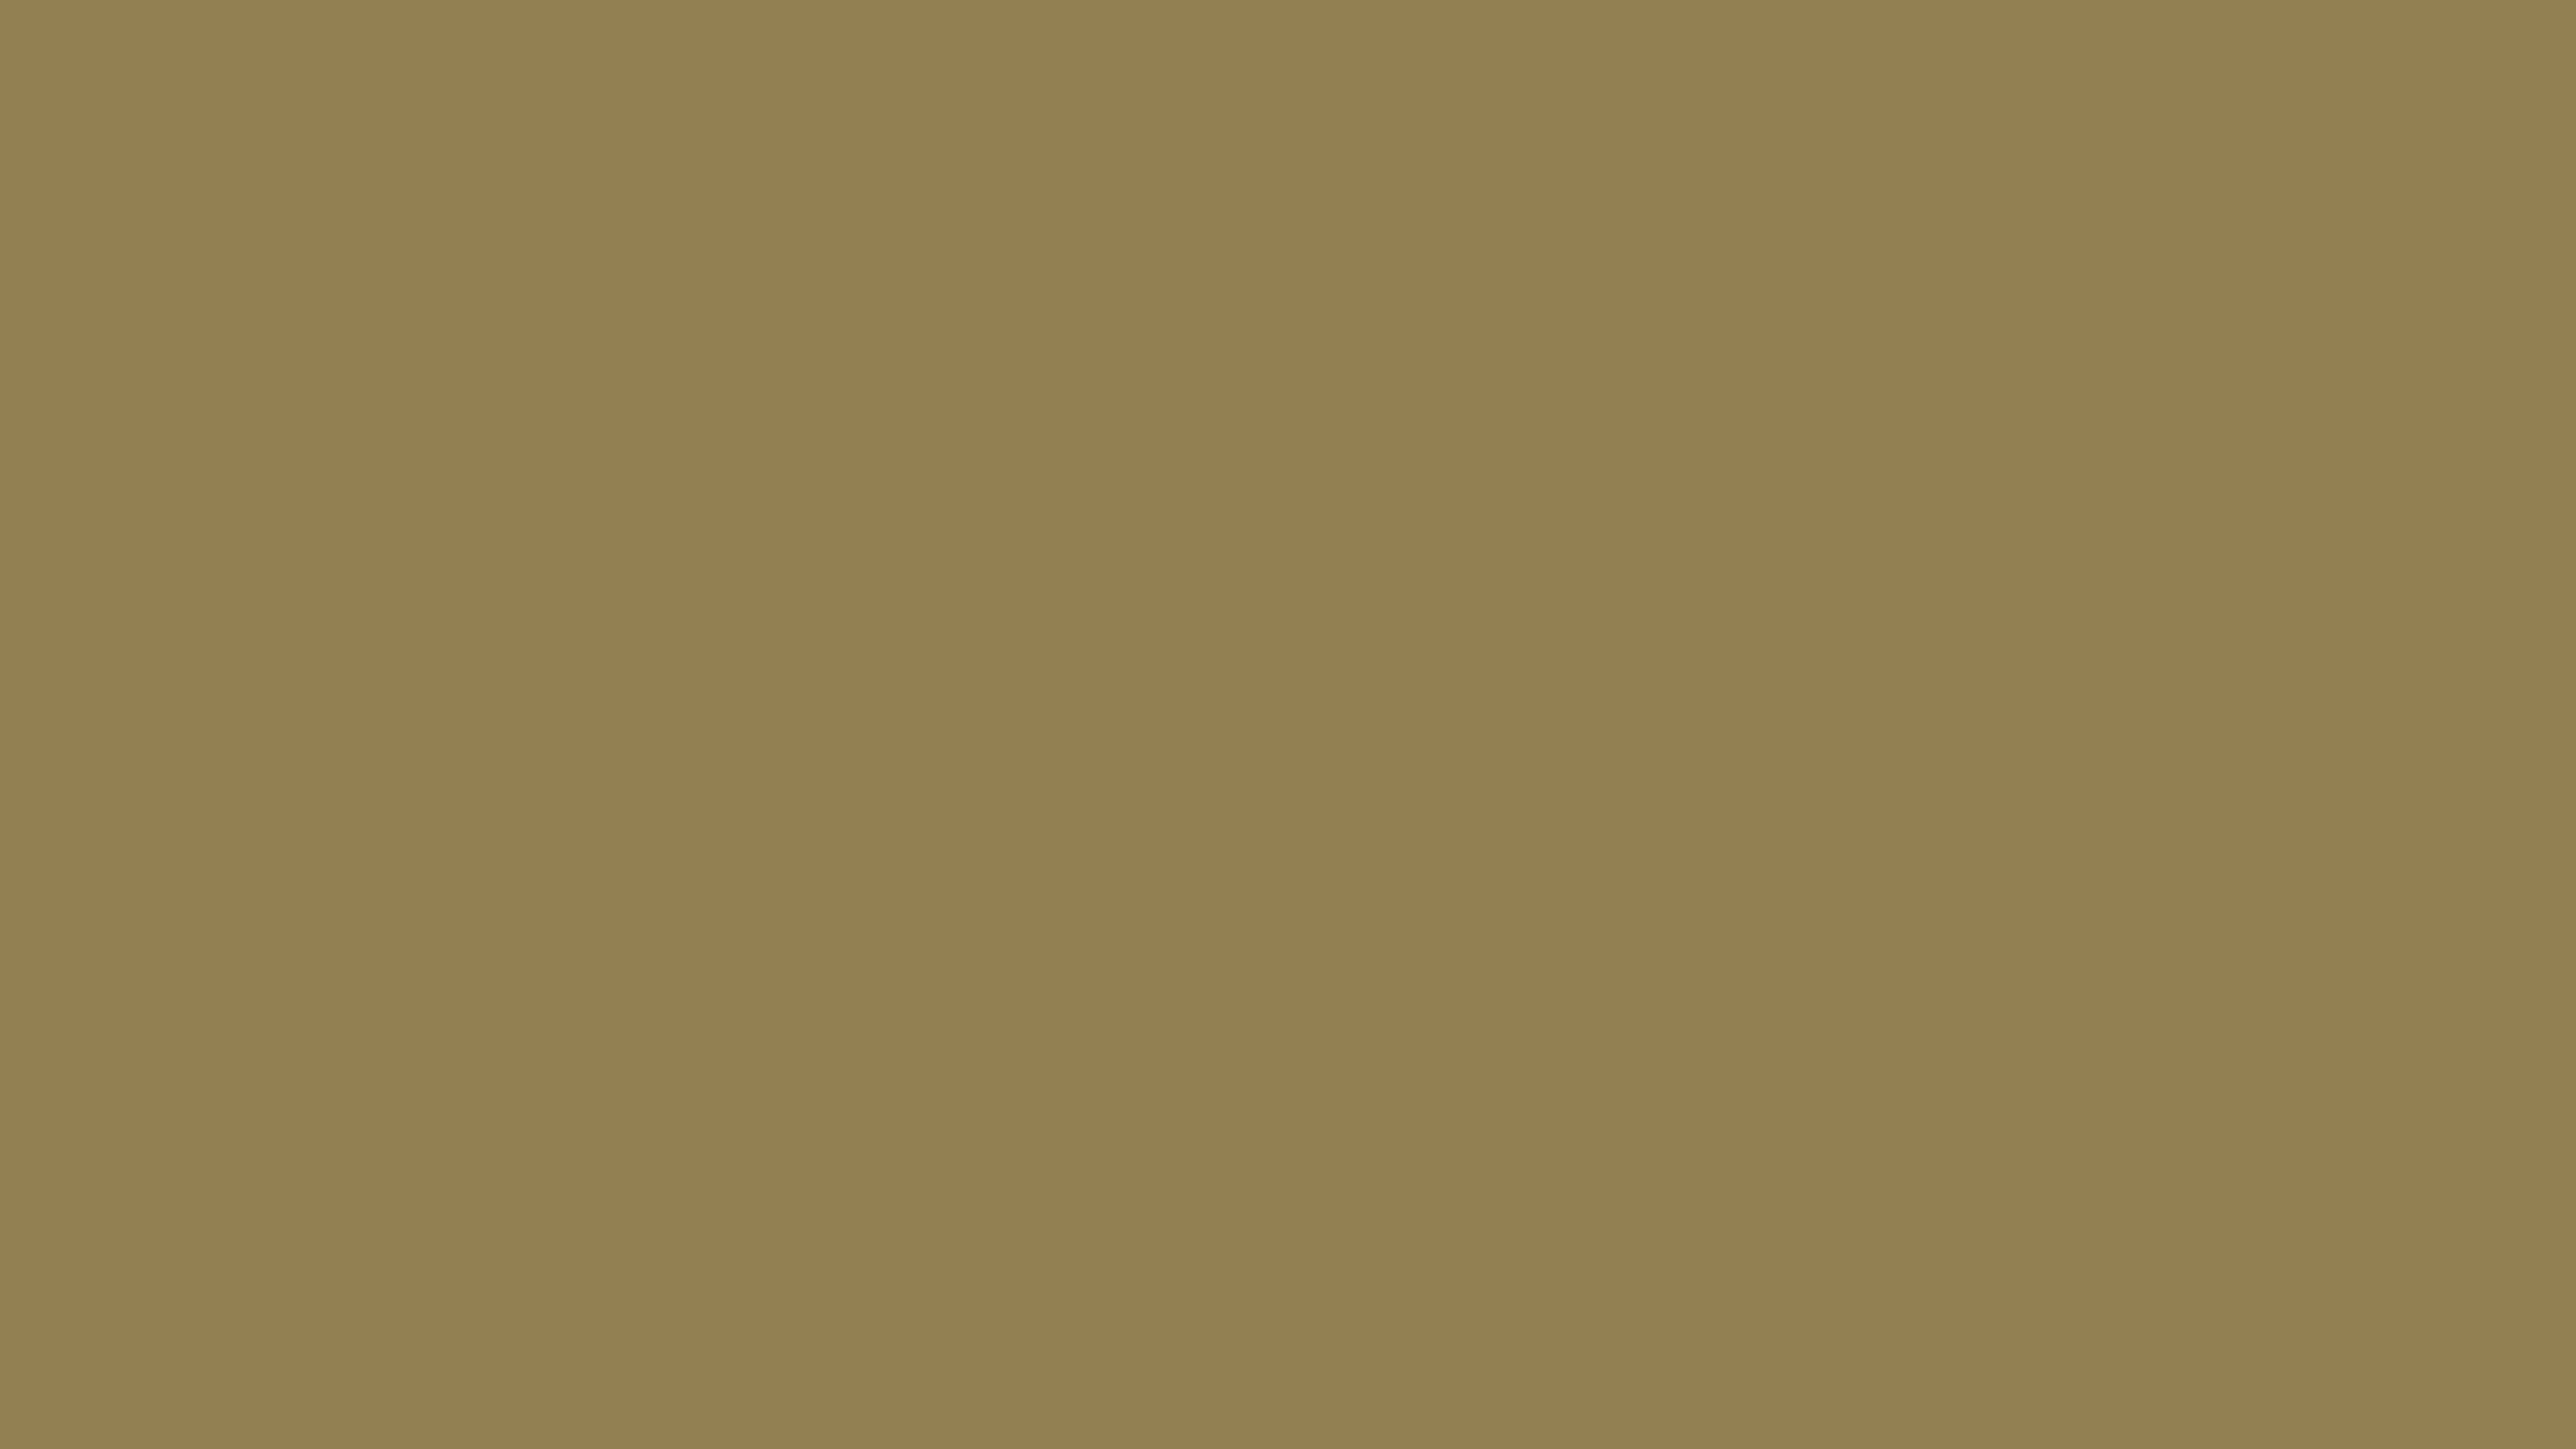 4096x2304 Dark Tan Solid Color Background